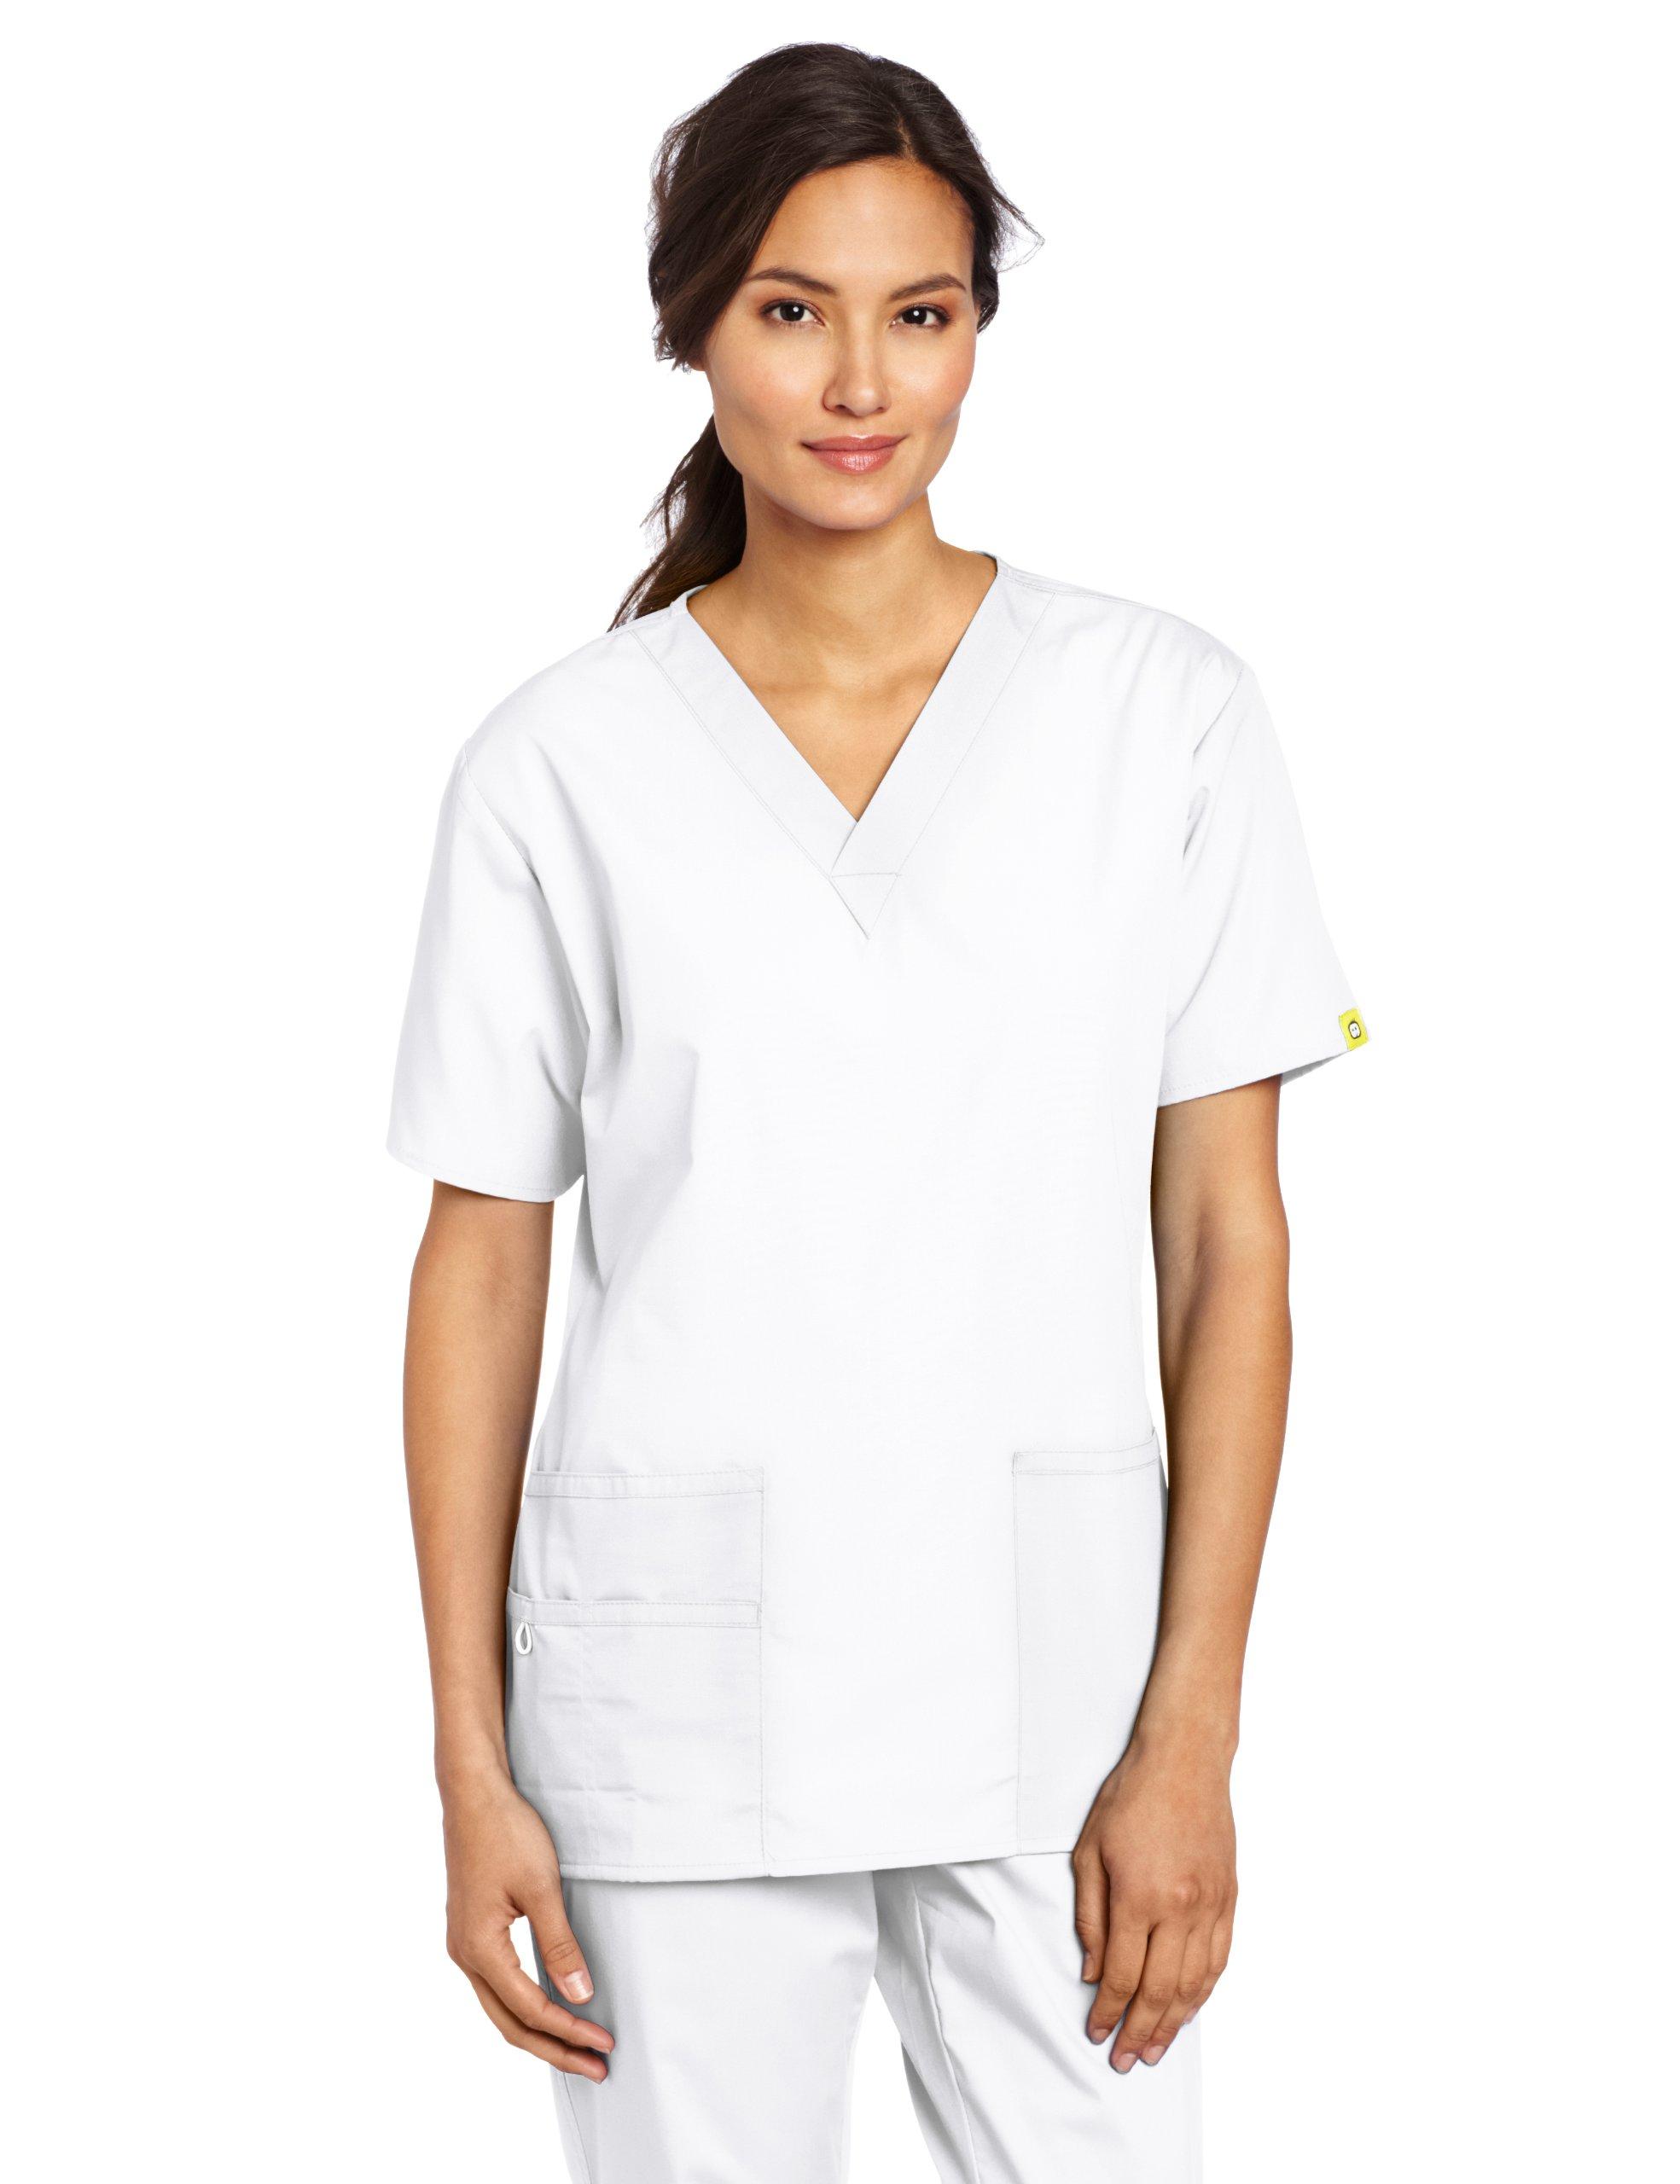 WonderWink Women's Scrubs Bravo 5 Pocket V-Neck Top, White, Large